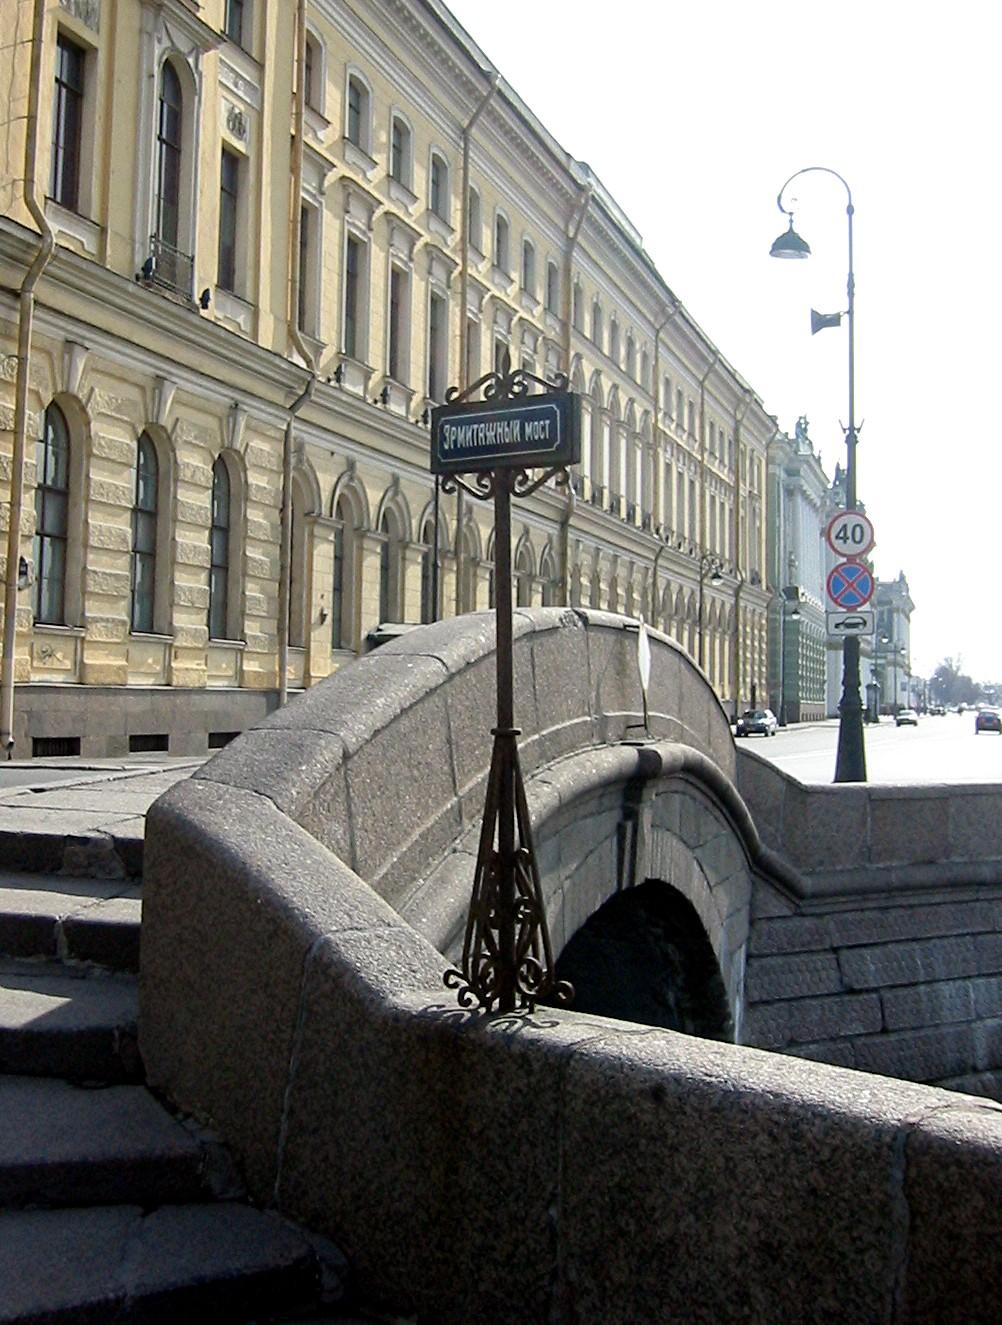 Эрмитажный мост. Фото: IKit (Wikimedia Commons)